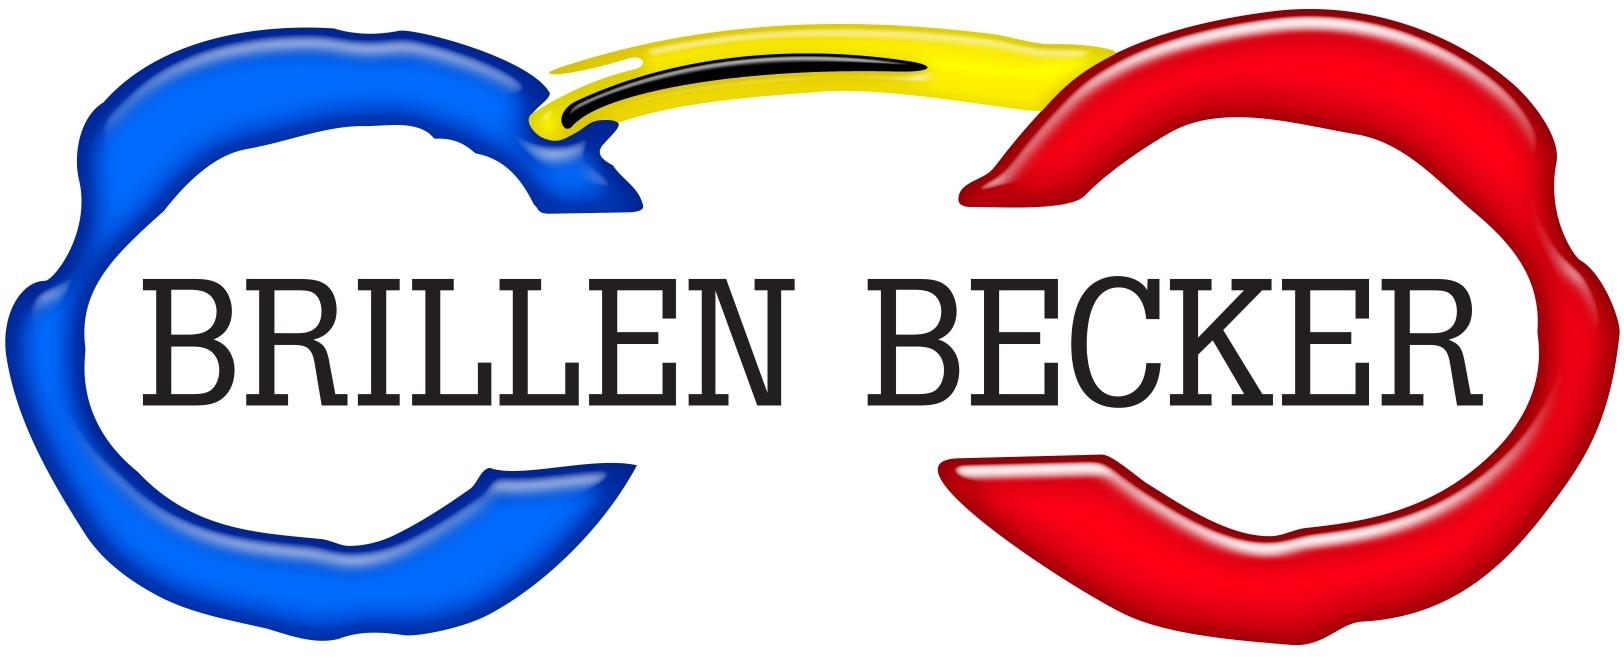 Brillen Becker